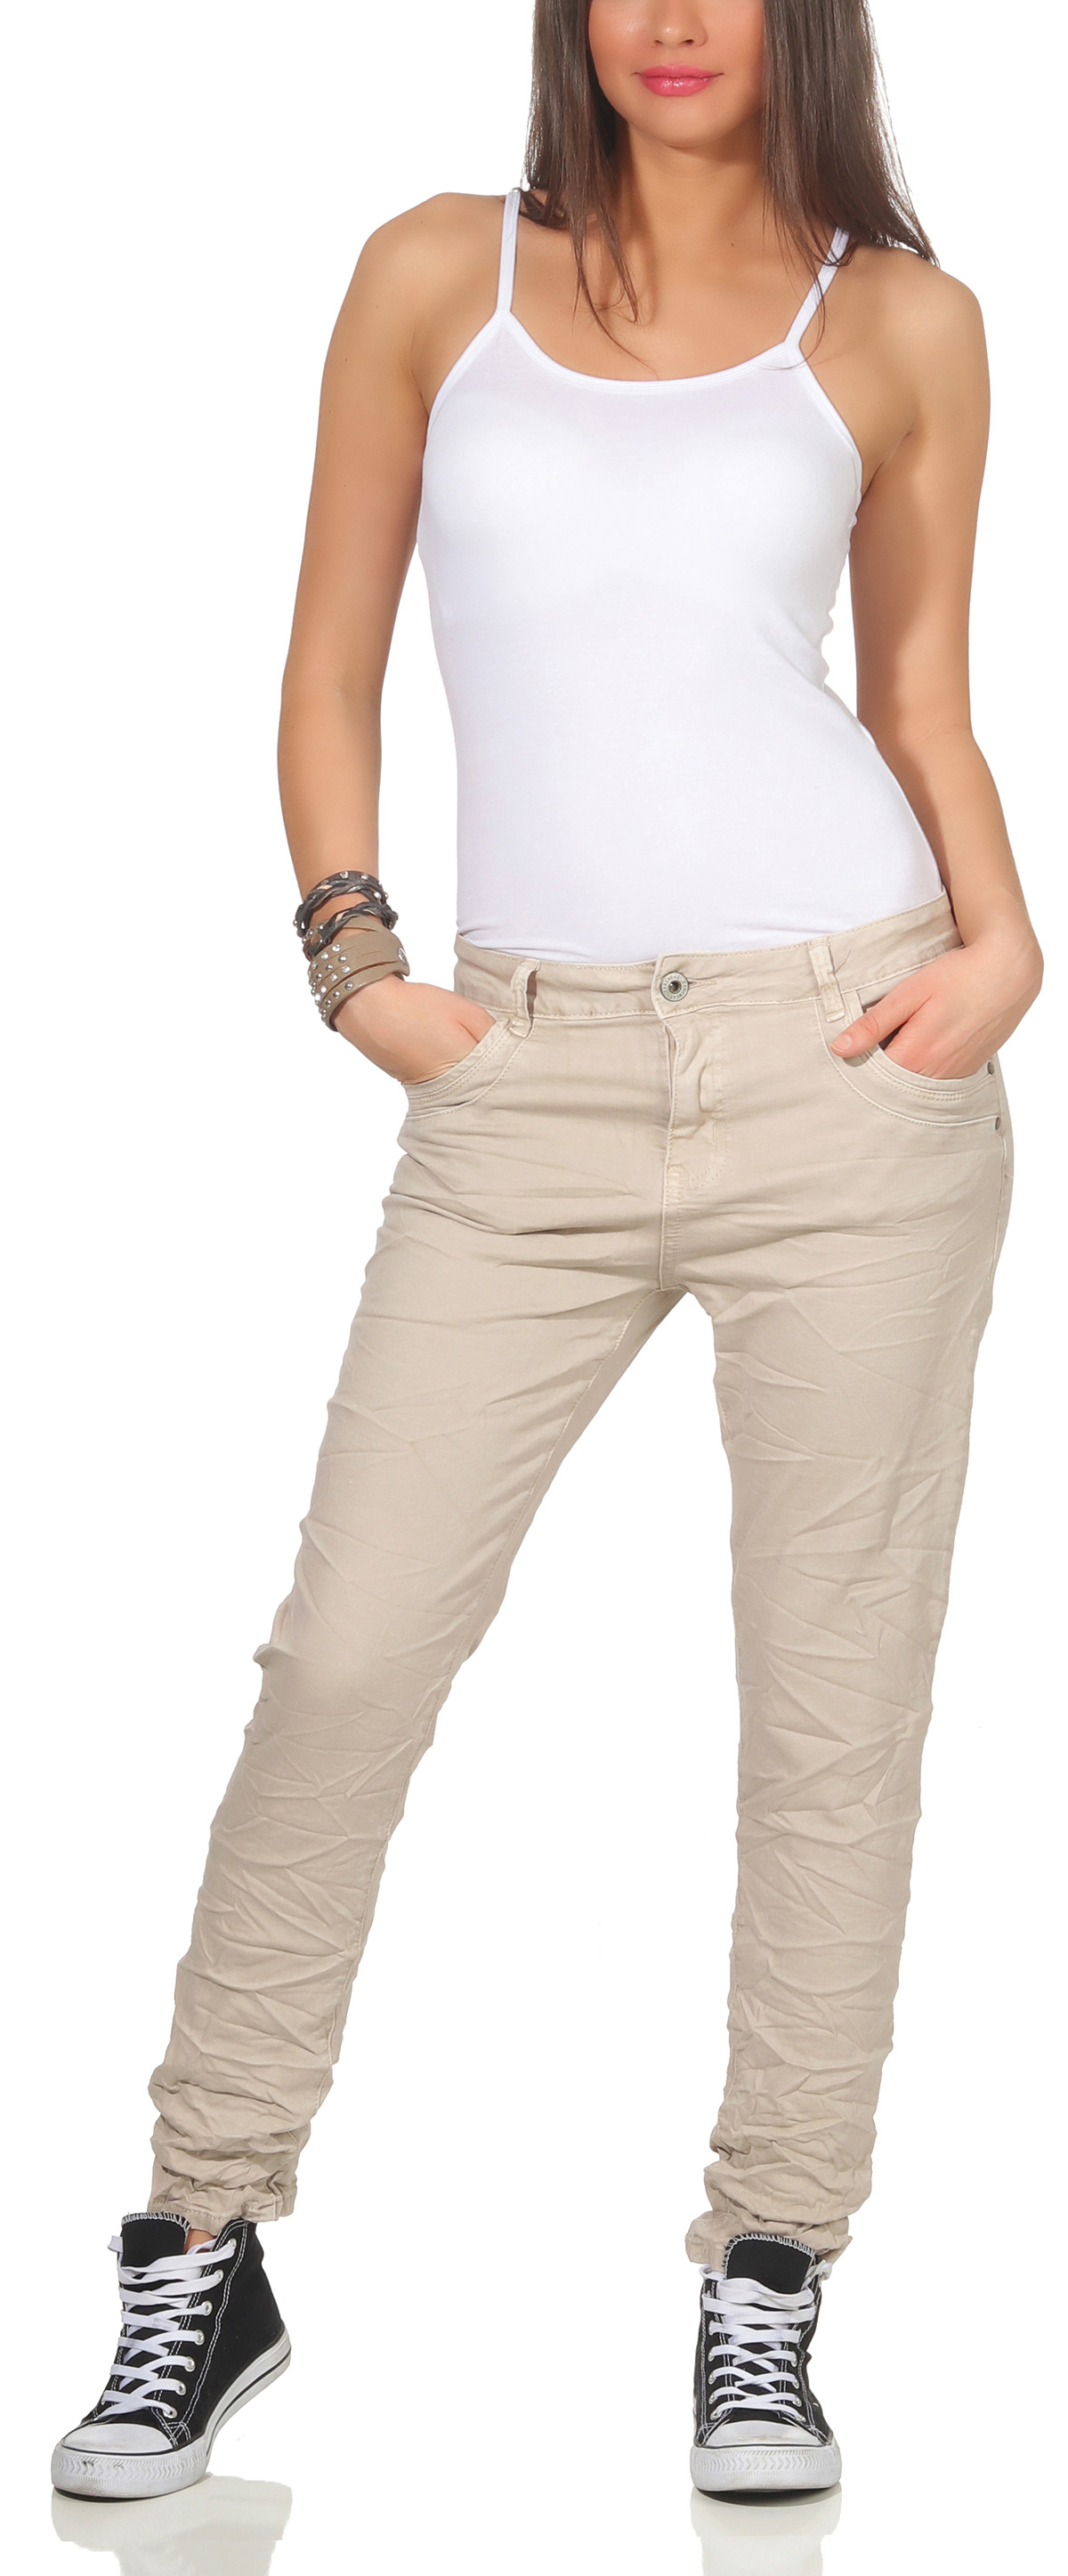 871a69ea506c0e Karostar Damen Jeans Hüfthose Baggy Pants Chino lange Hose Denim ...